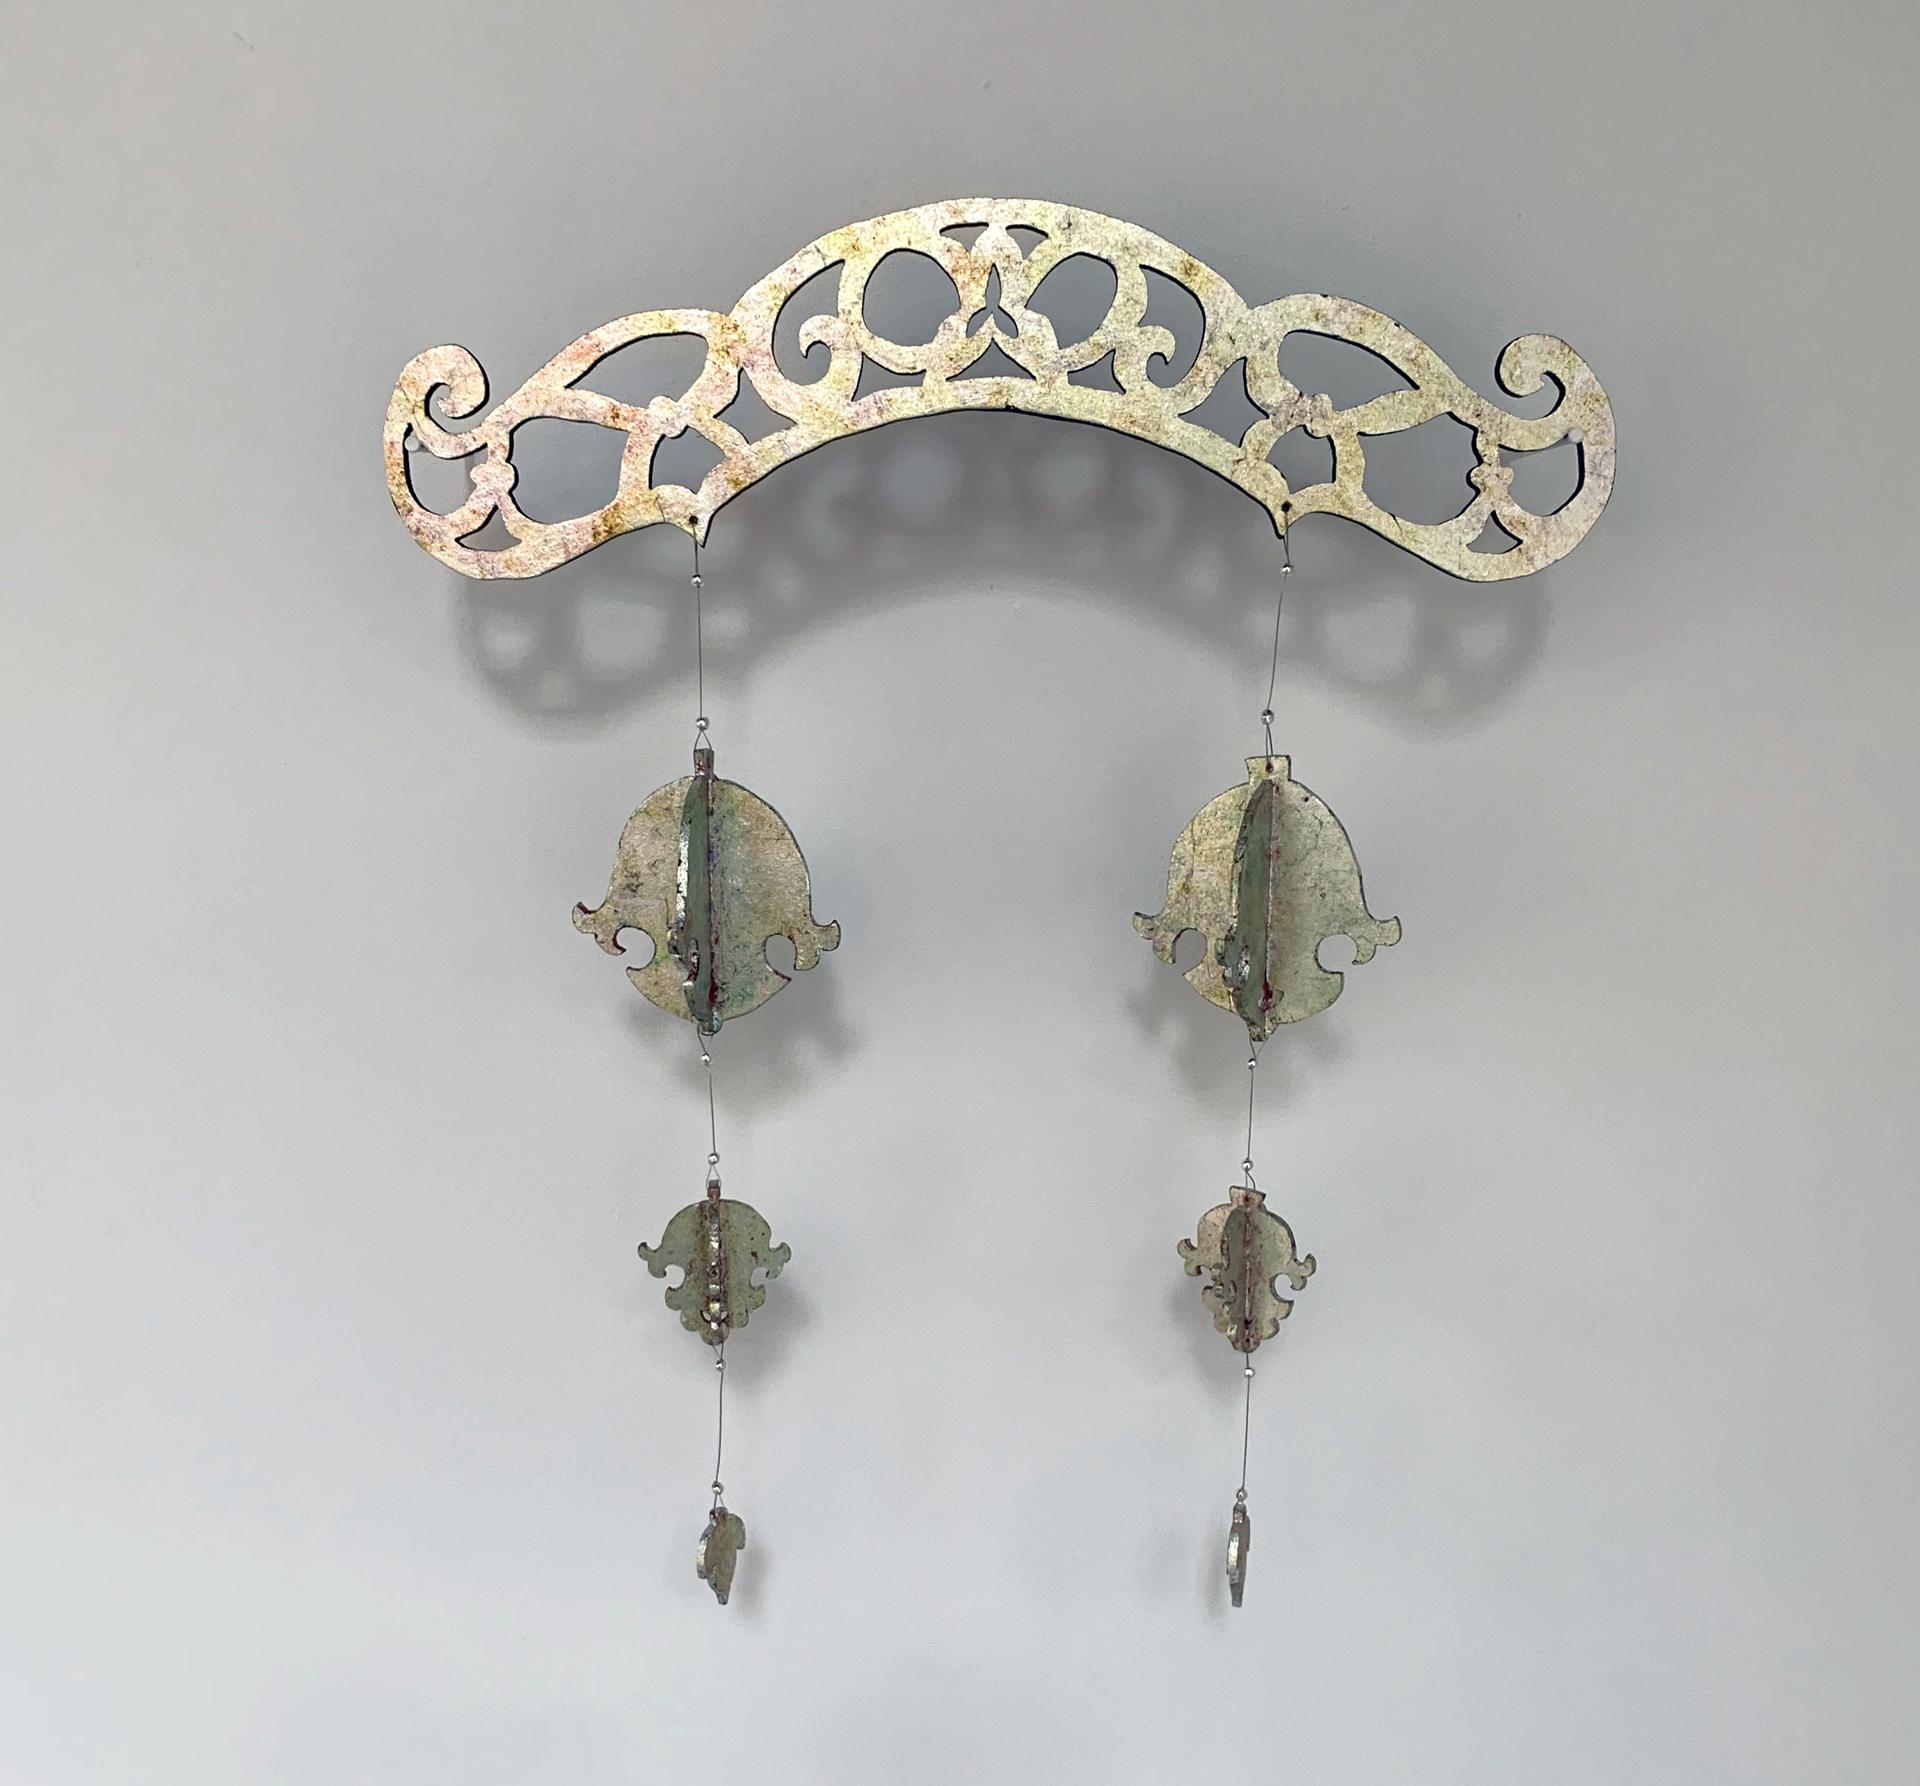 Temple Bells by June Sekiguchi